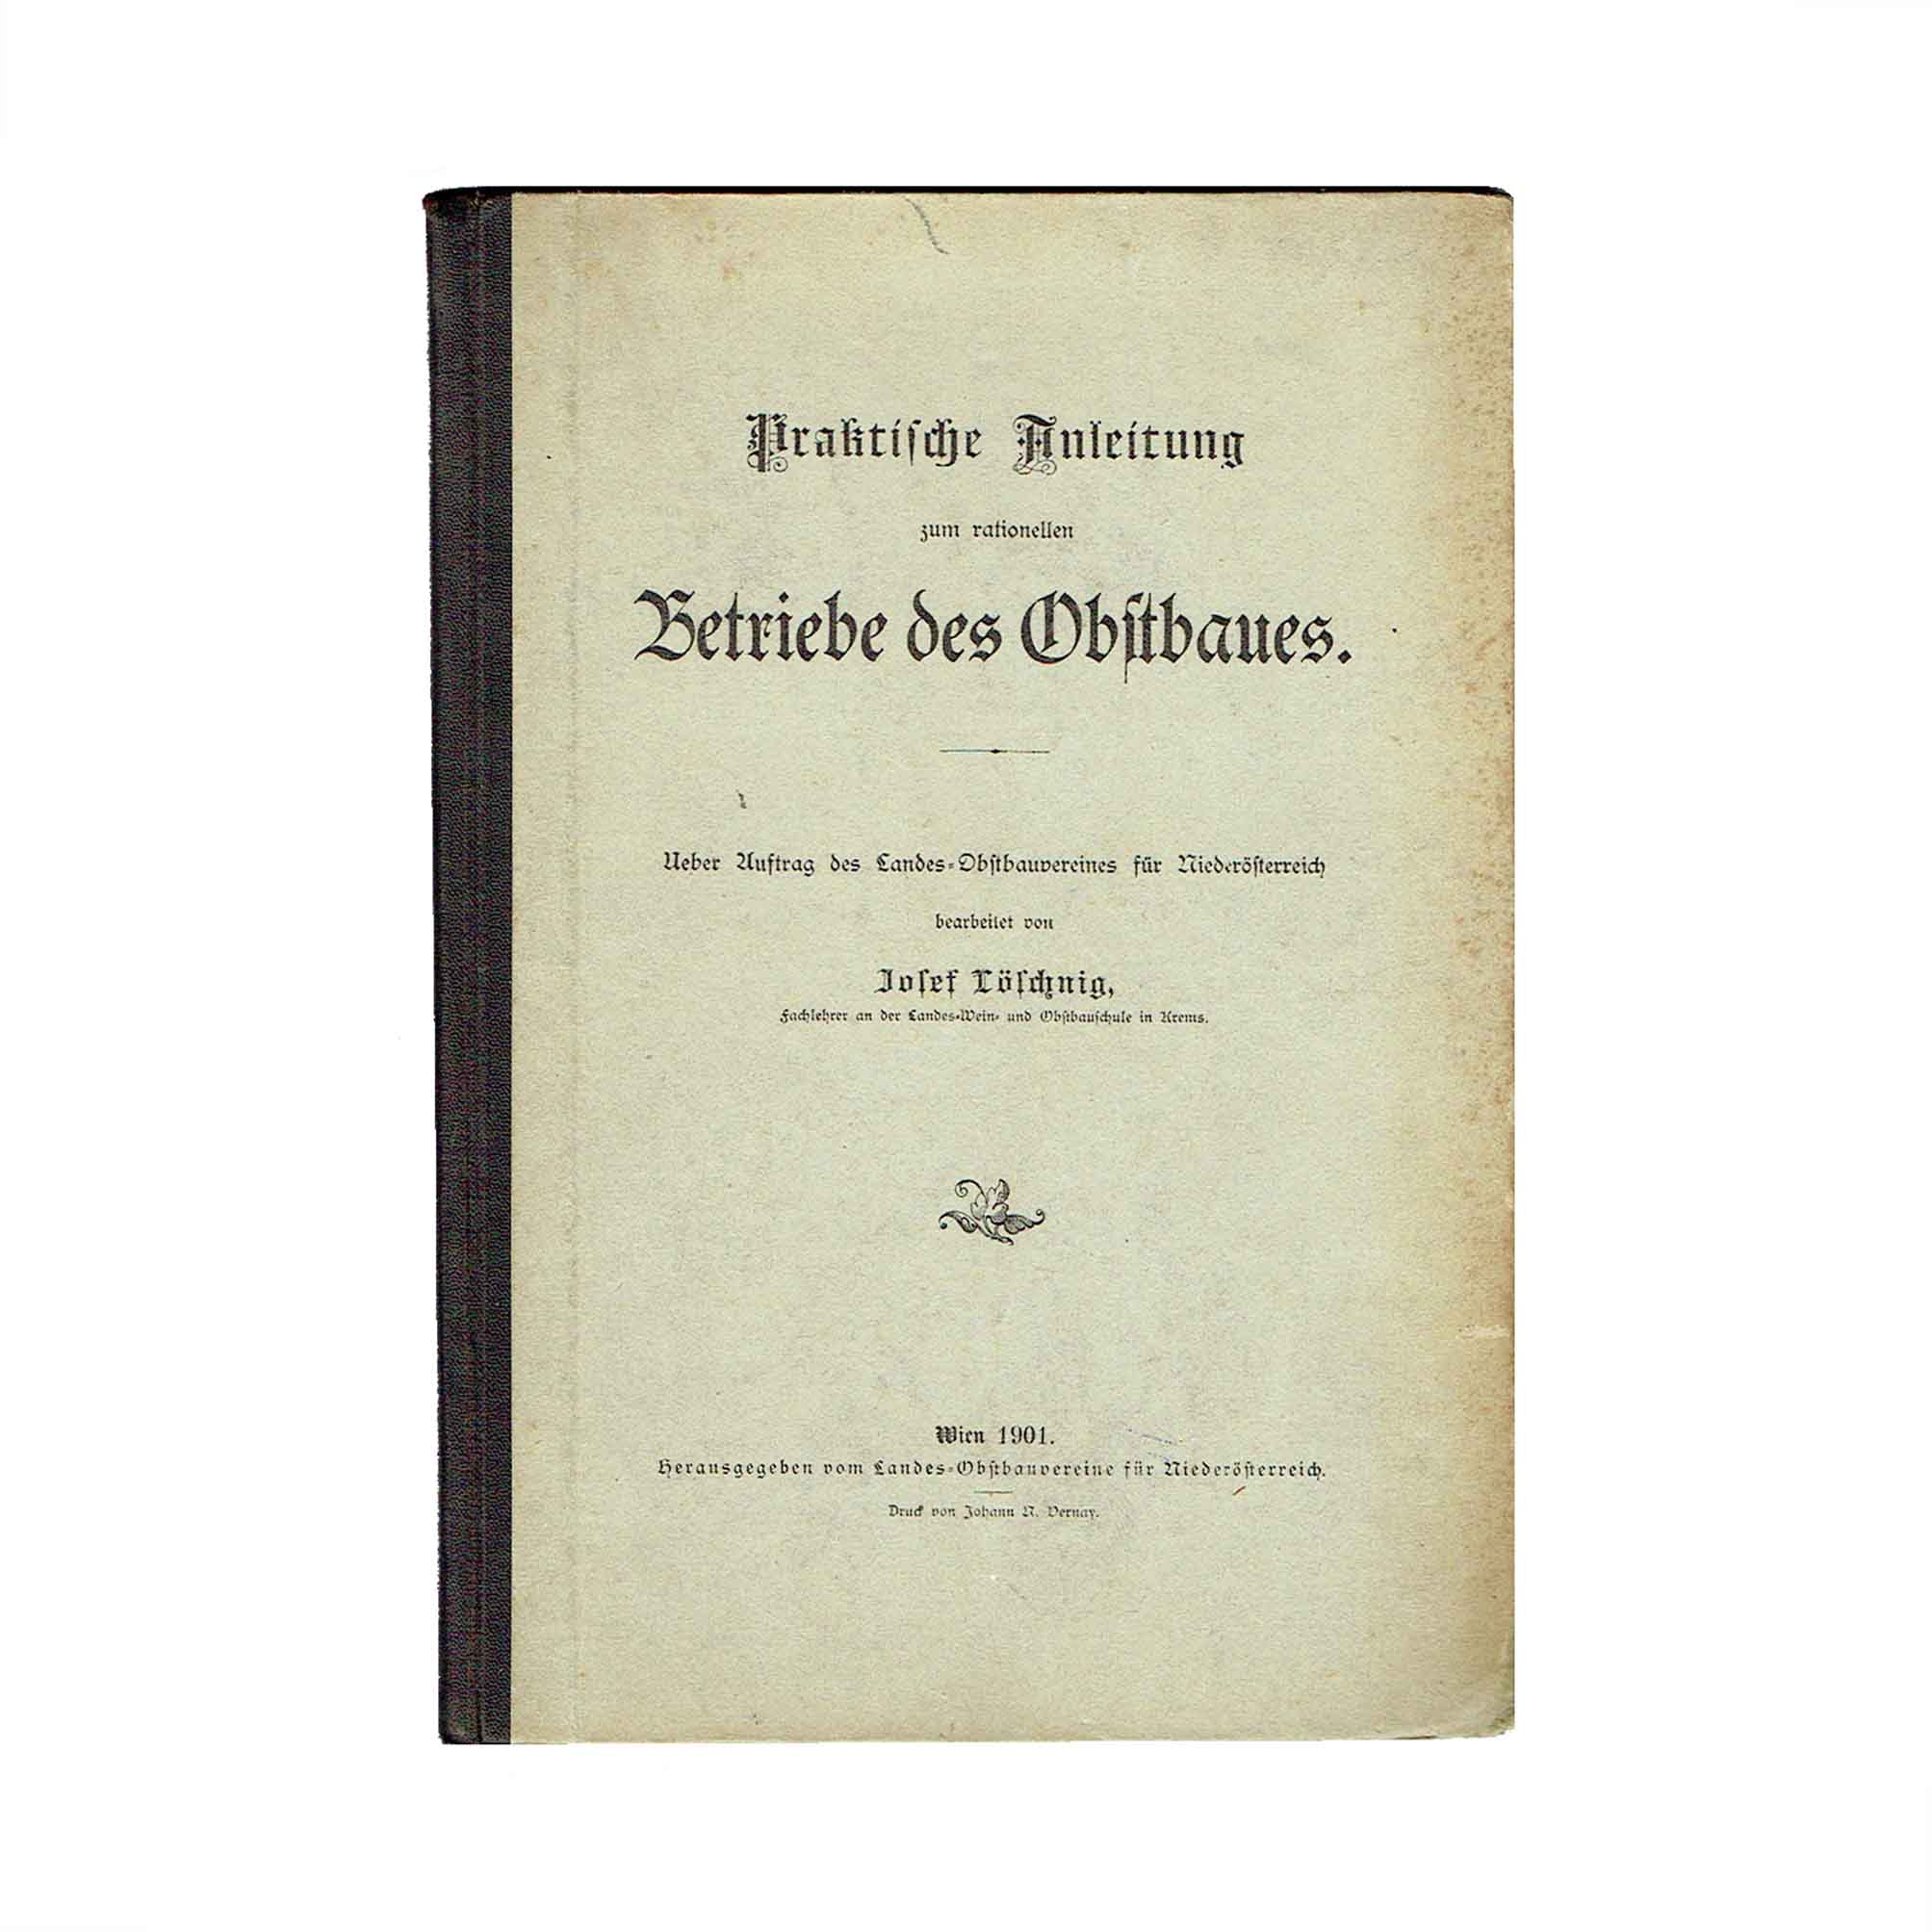 5549-Lösching-Anleitung-Obstbau-1901-Einband-frei-N.jpg